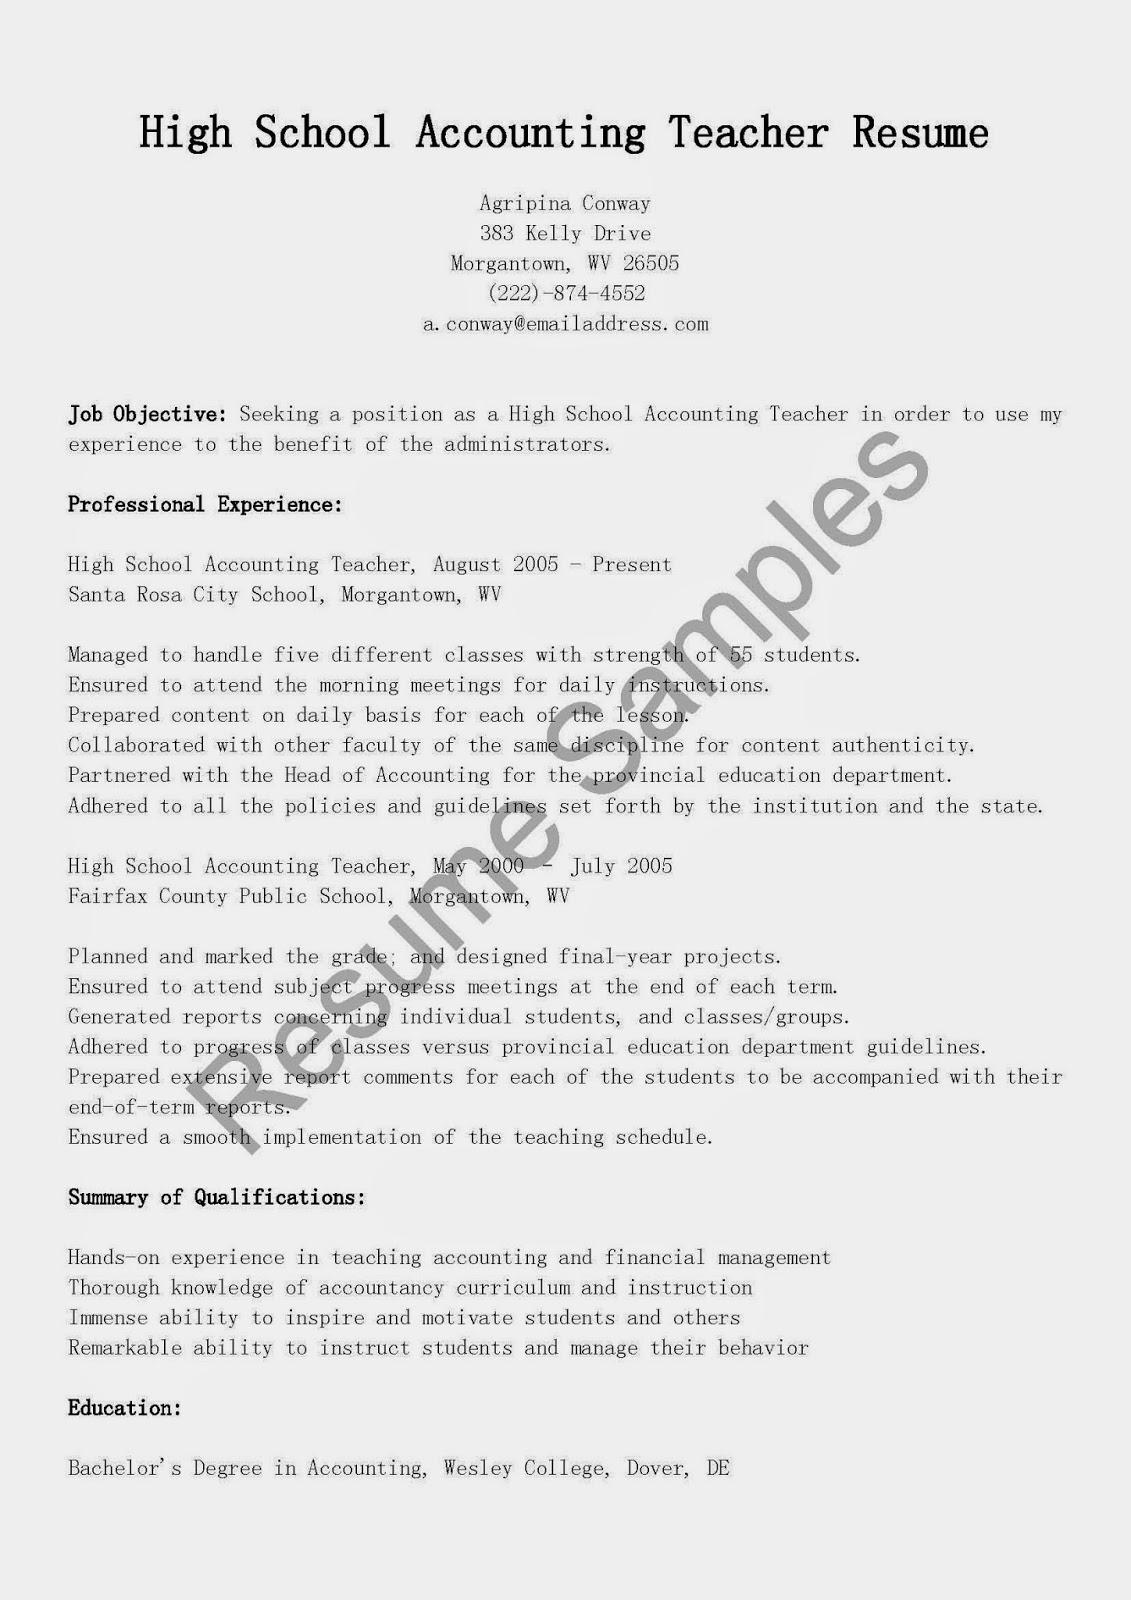 sample resume of a teacher in high school - resume samples high school accounting teacher resume sample